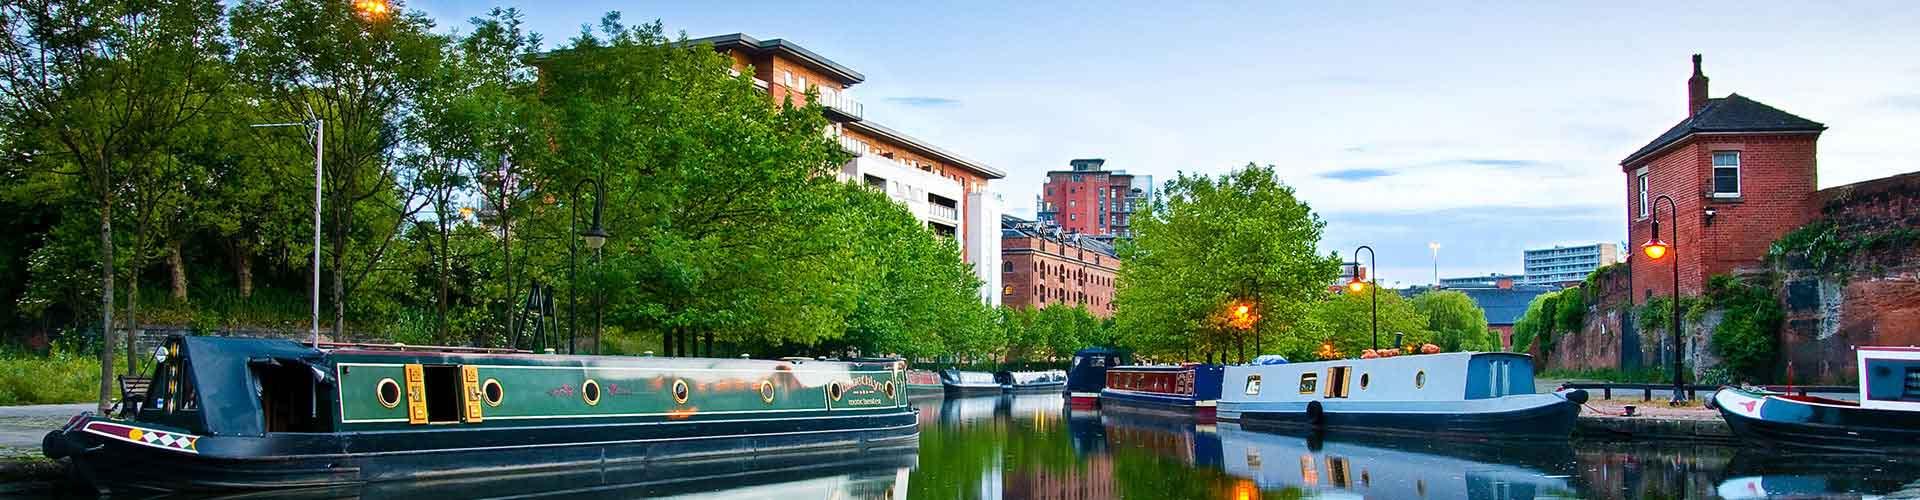 Manchester – Appartamenti a Manchester. Mappe per Manchester, Foto e  Recensioni per ogni Appartamento a Manchester.